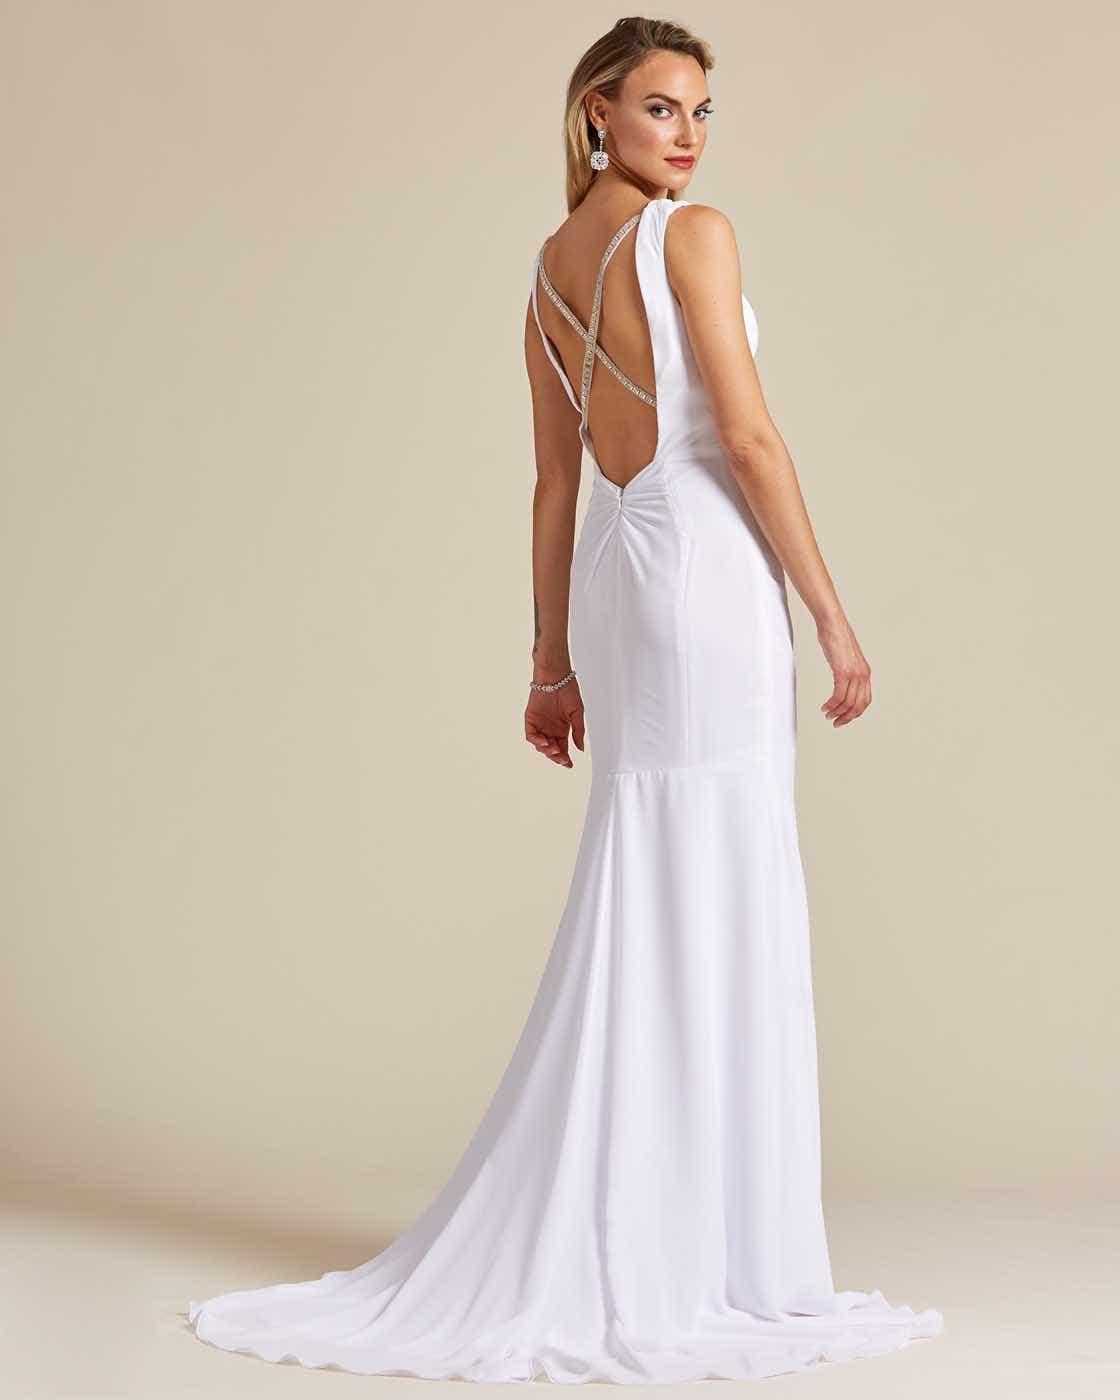 Ivory White Criss Cross Wedding Dress - Back